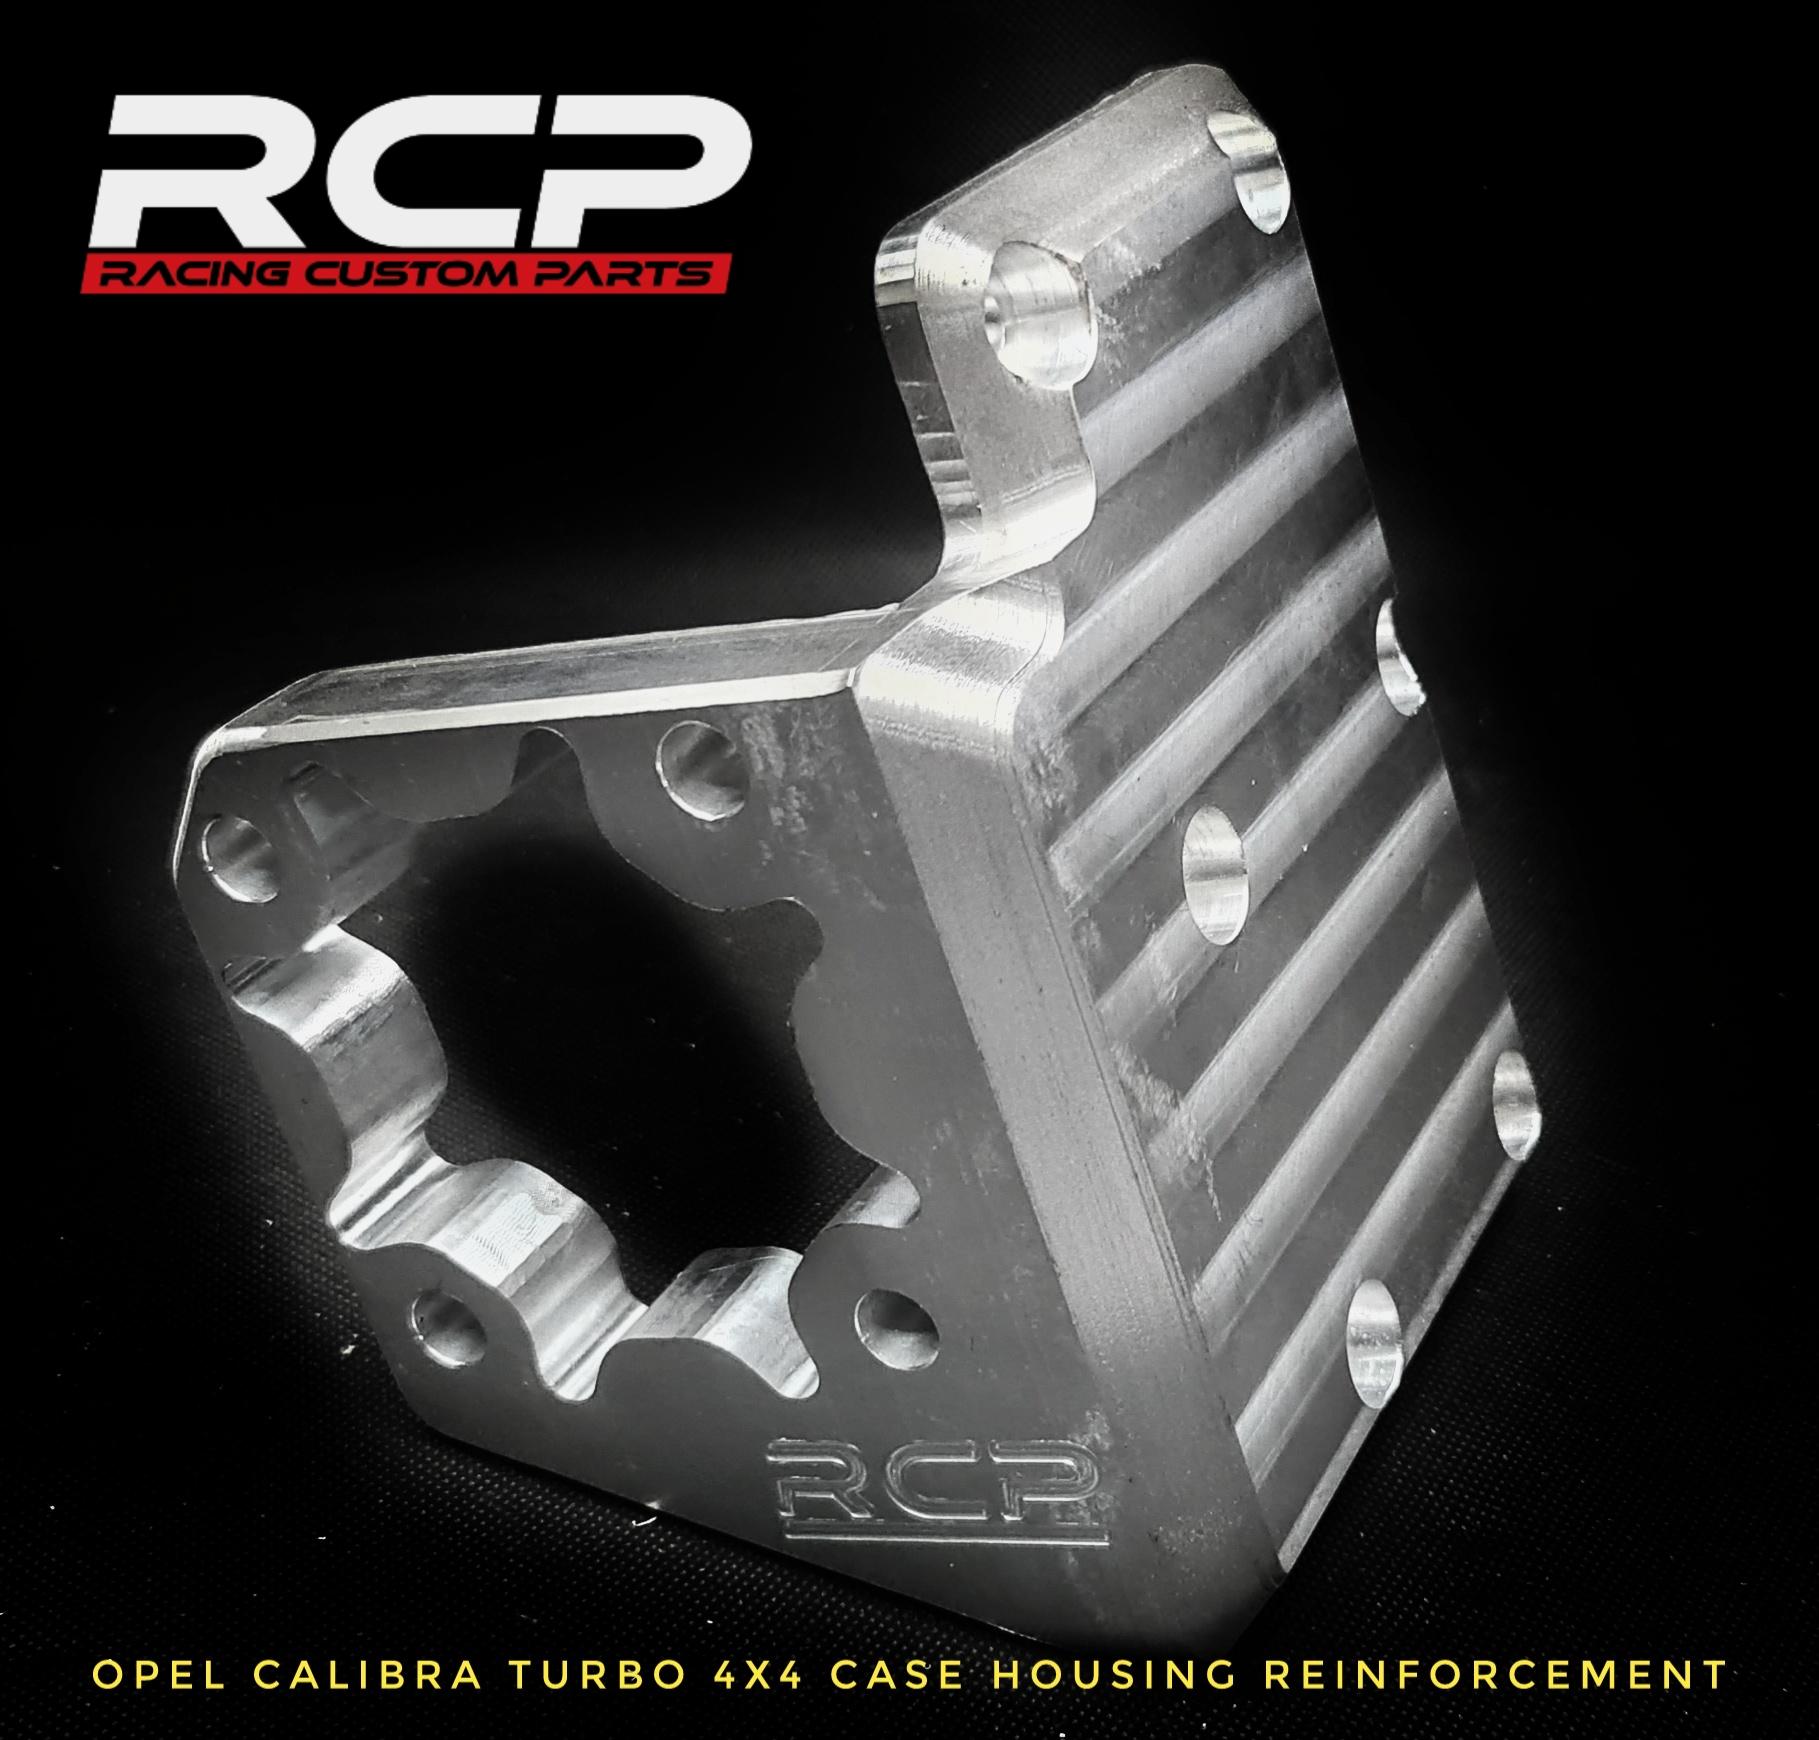 opel calibra turbo c20let transfer case 4x4 reinforcement plate billet cnc racing custom parts